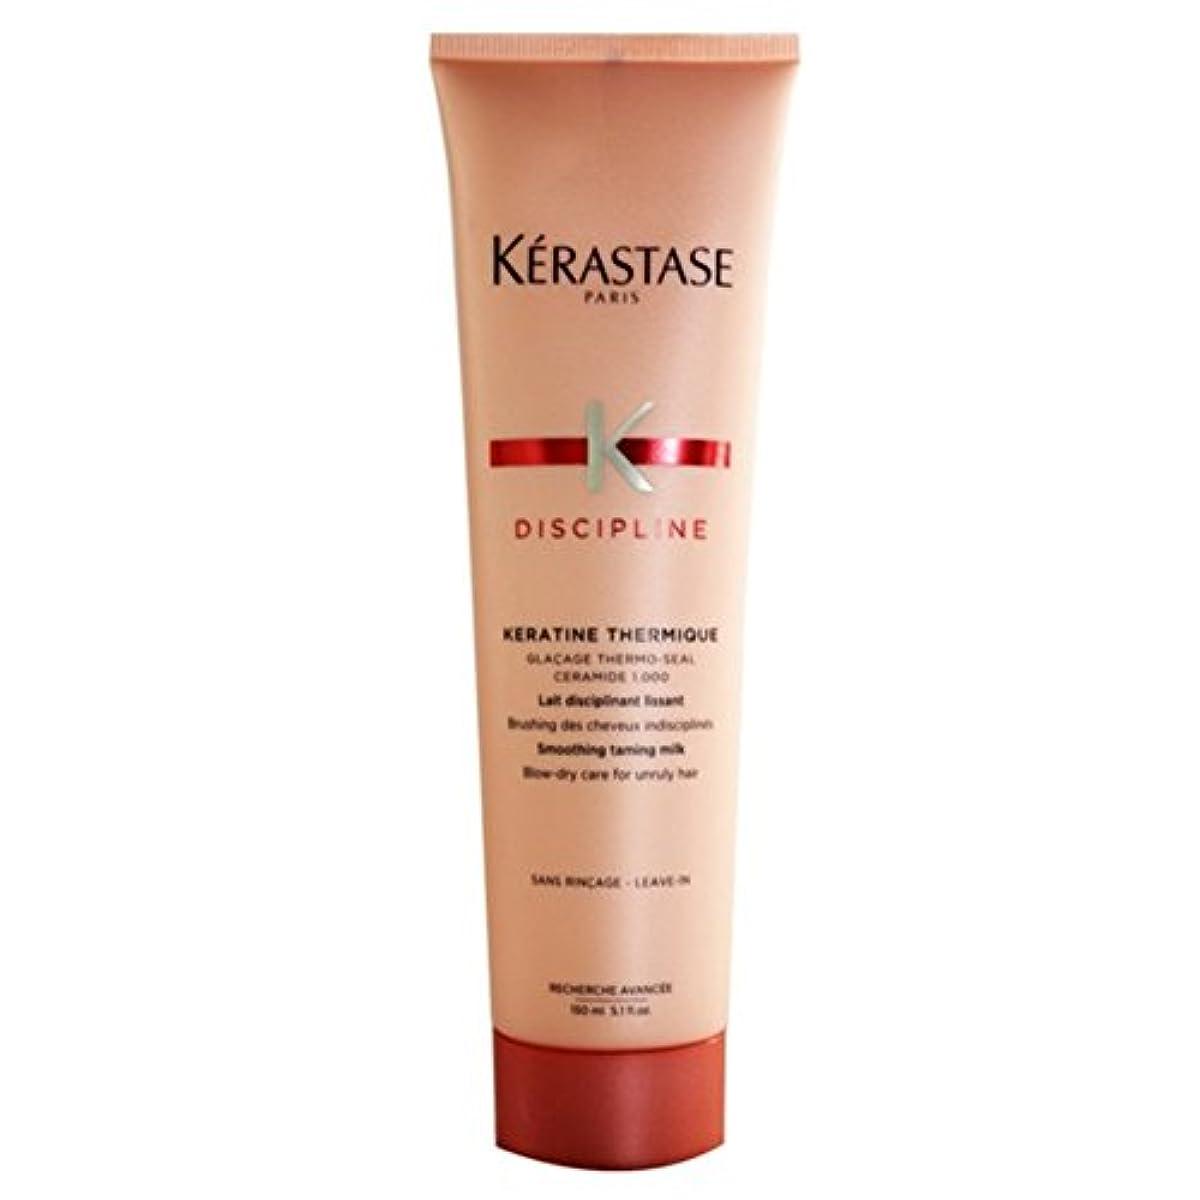 KERASTASE(ケラスターゼ) ケラチンサークリックスムージングティミングミルク (Discipline Keratine Thermique Smoothing Taming Milk) 150ml [海外直送品]...